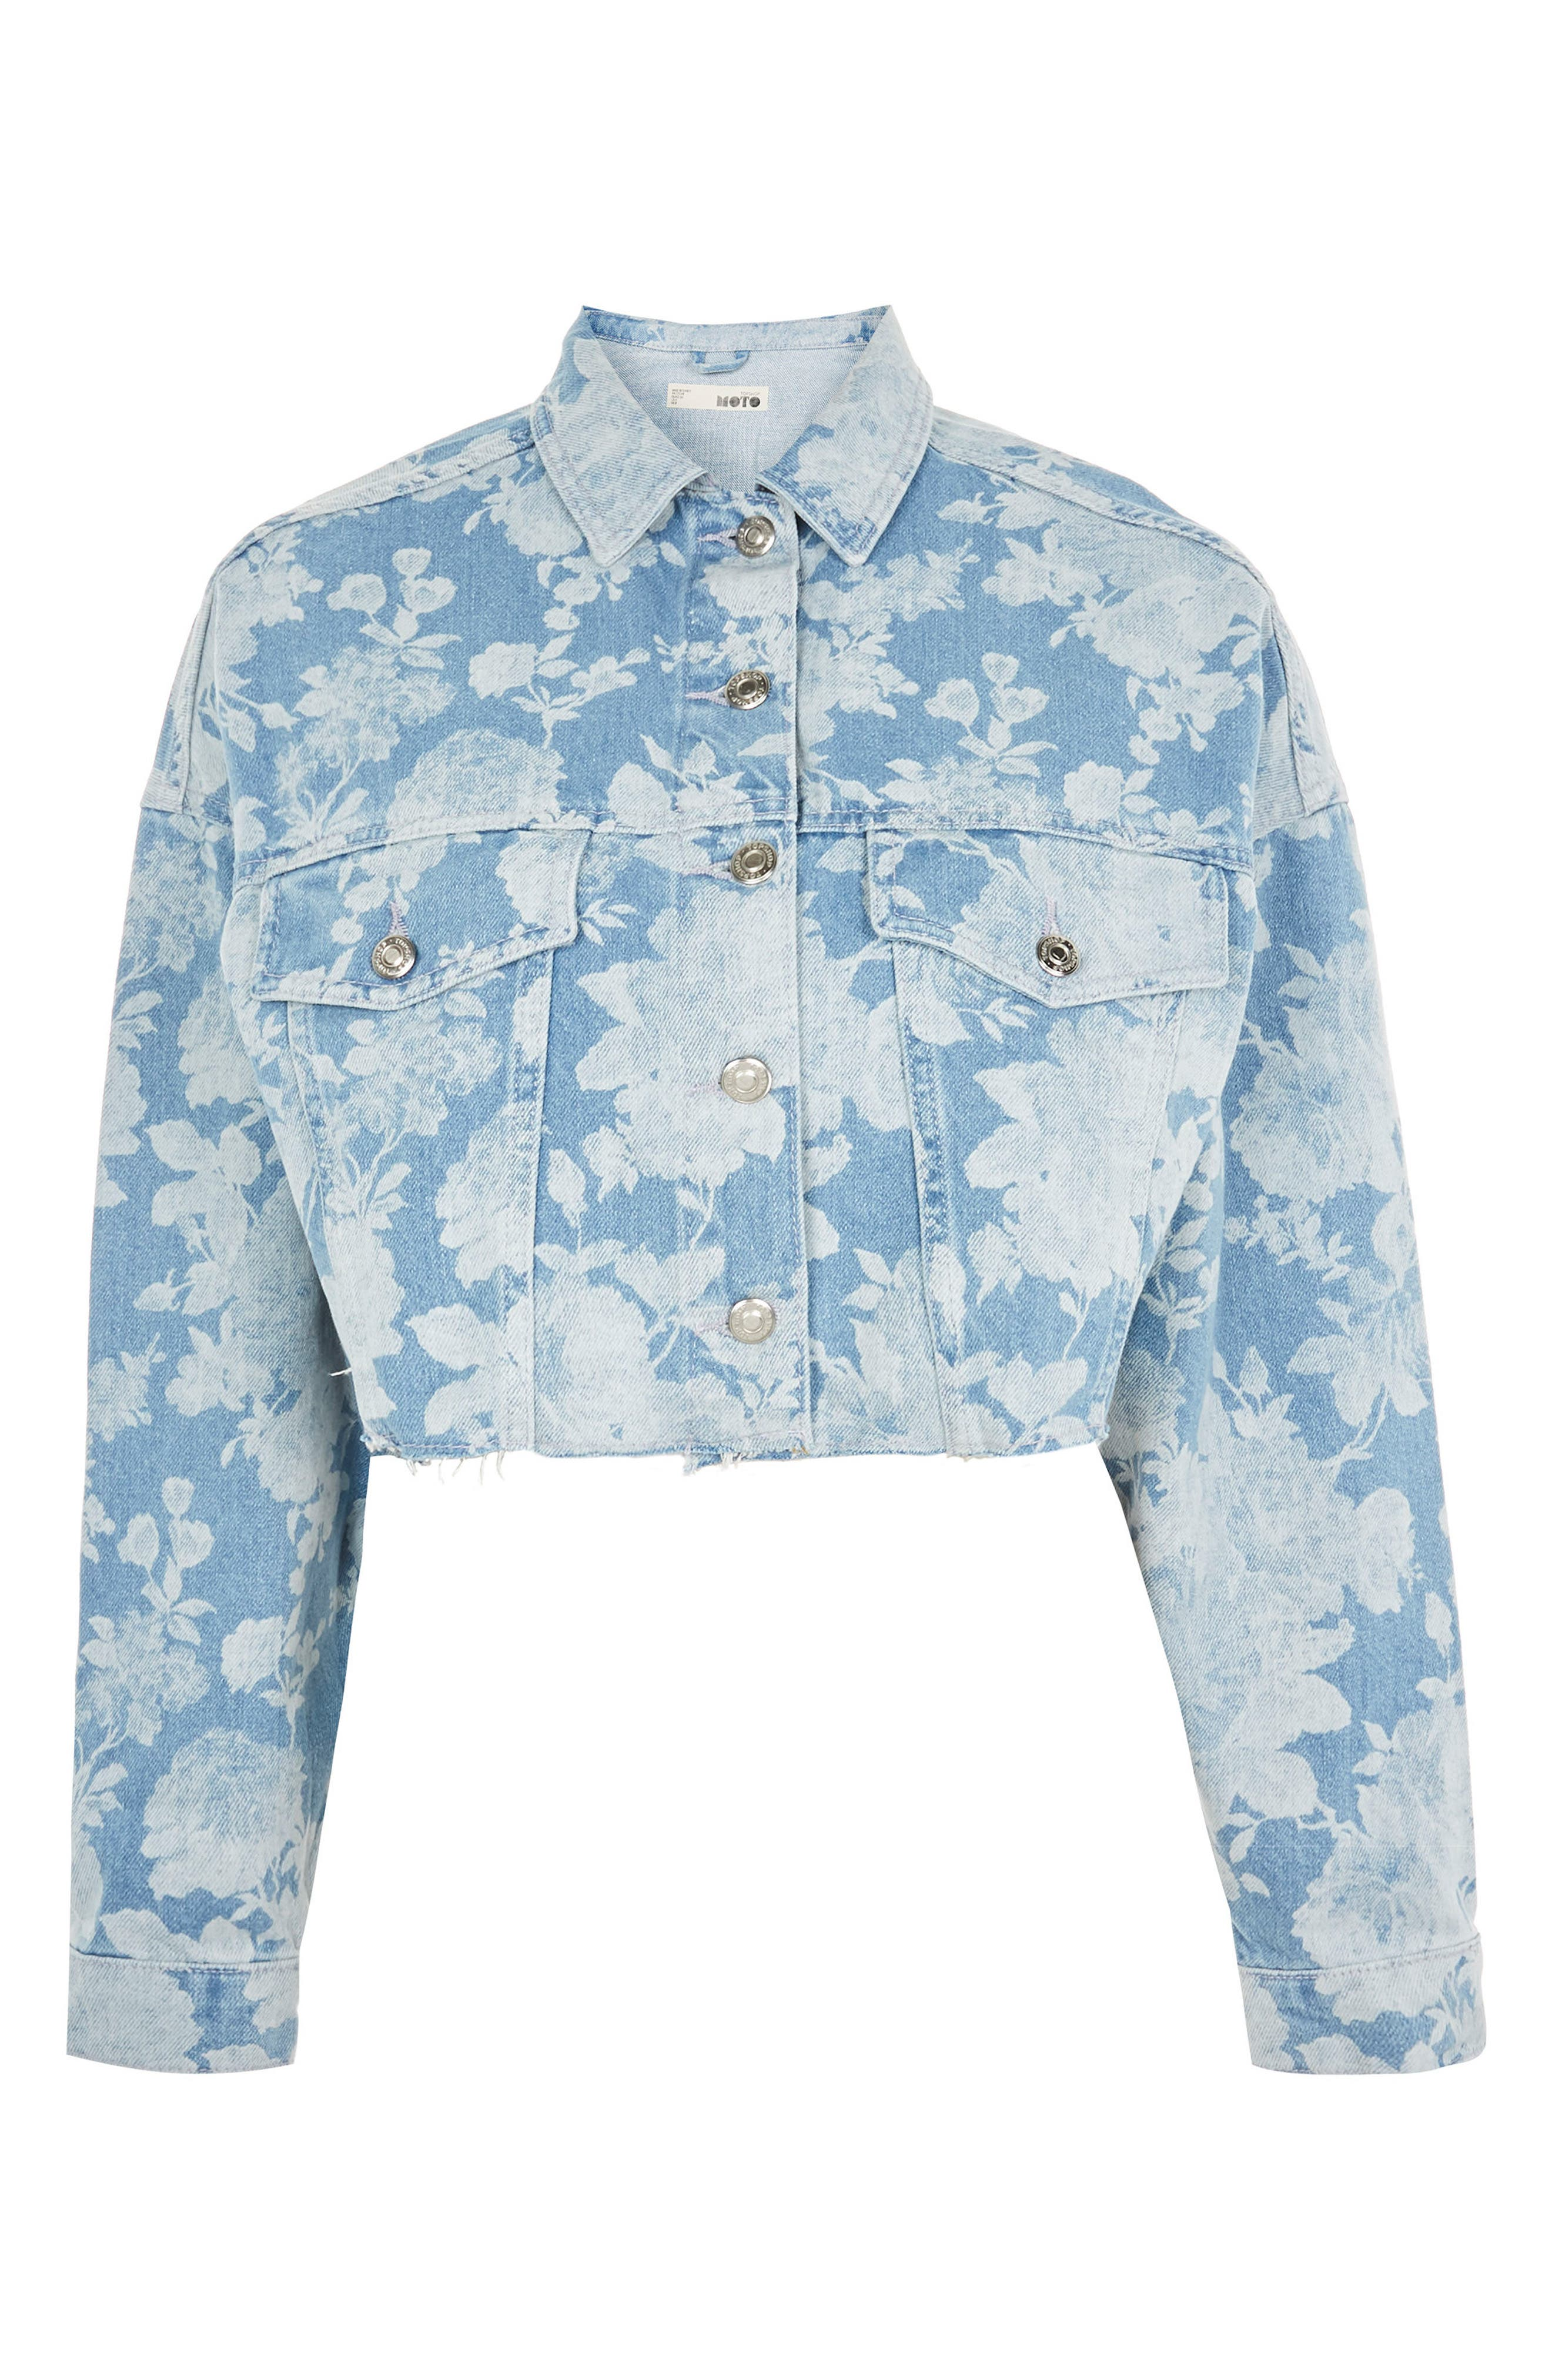 Floral Moto Two-Tone Denim Jacket,                             Alternate thumbnail 4, color,                             420